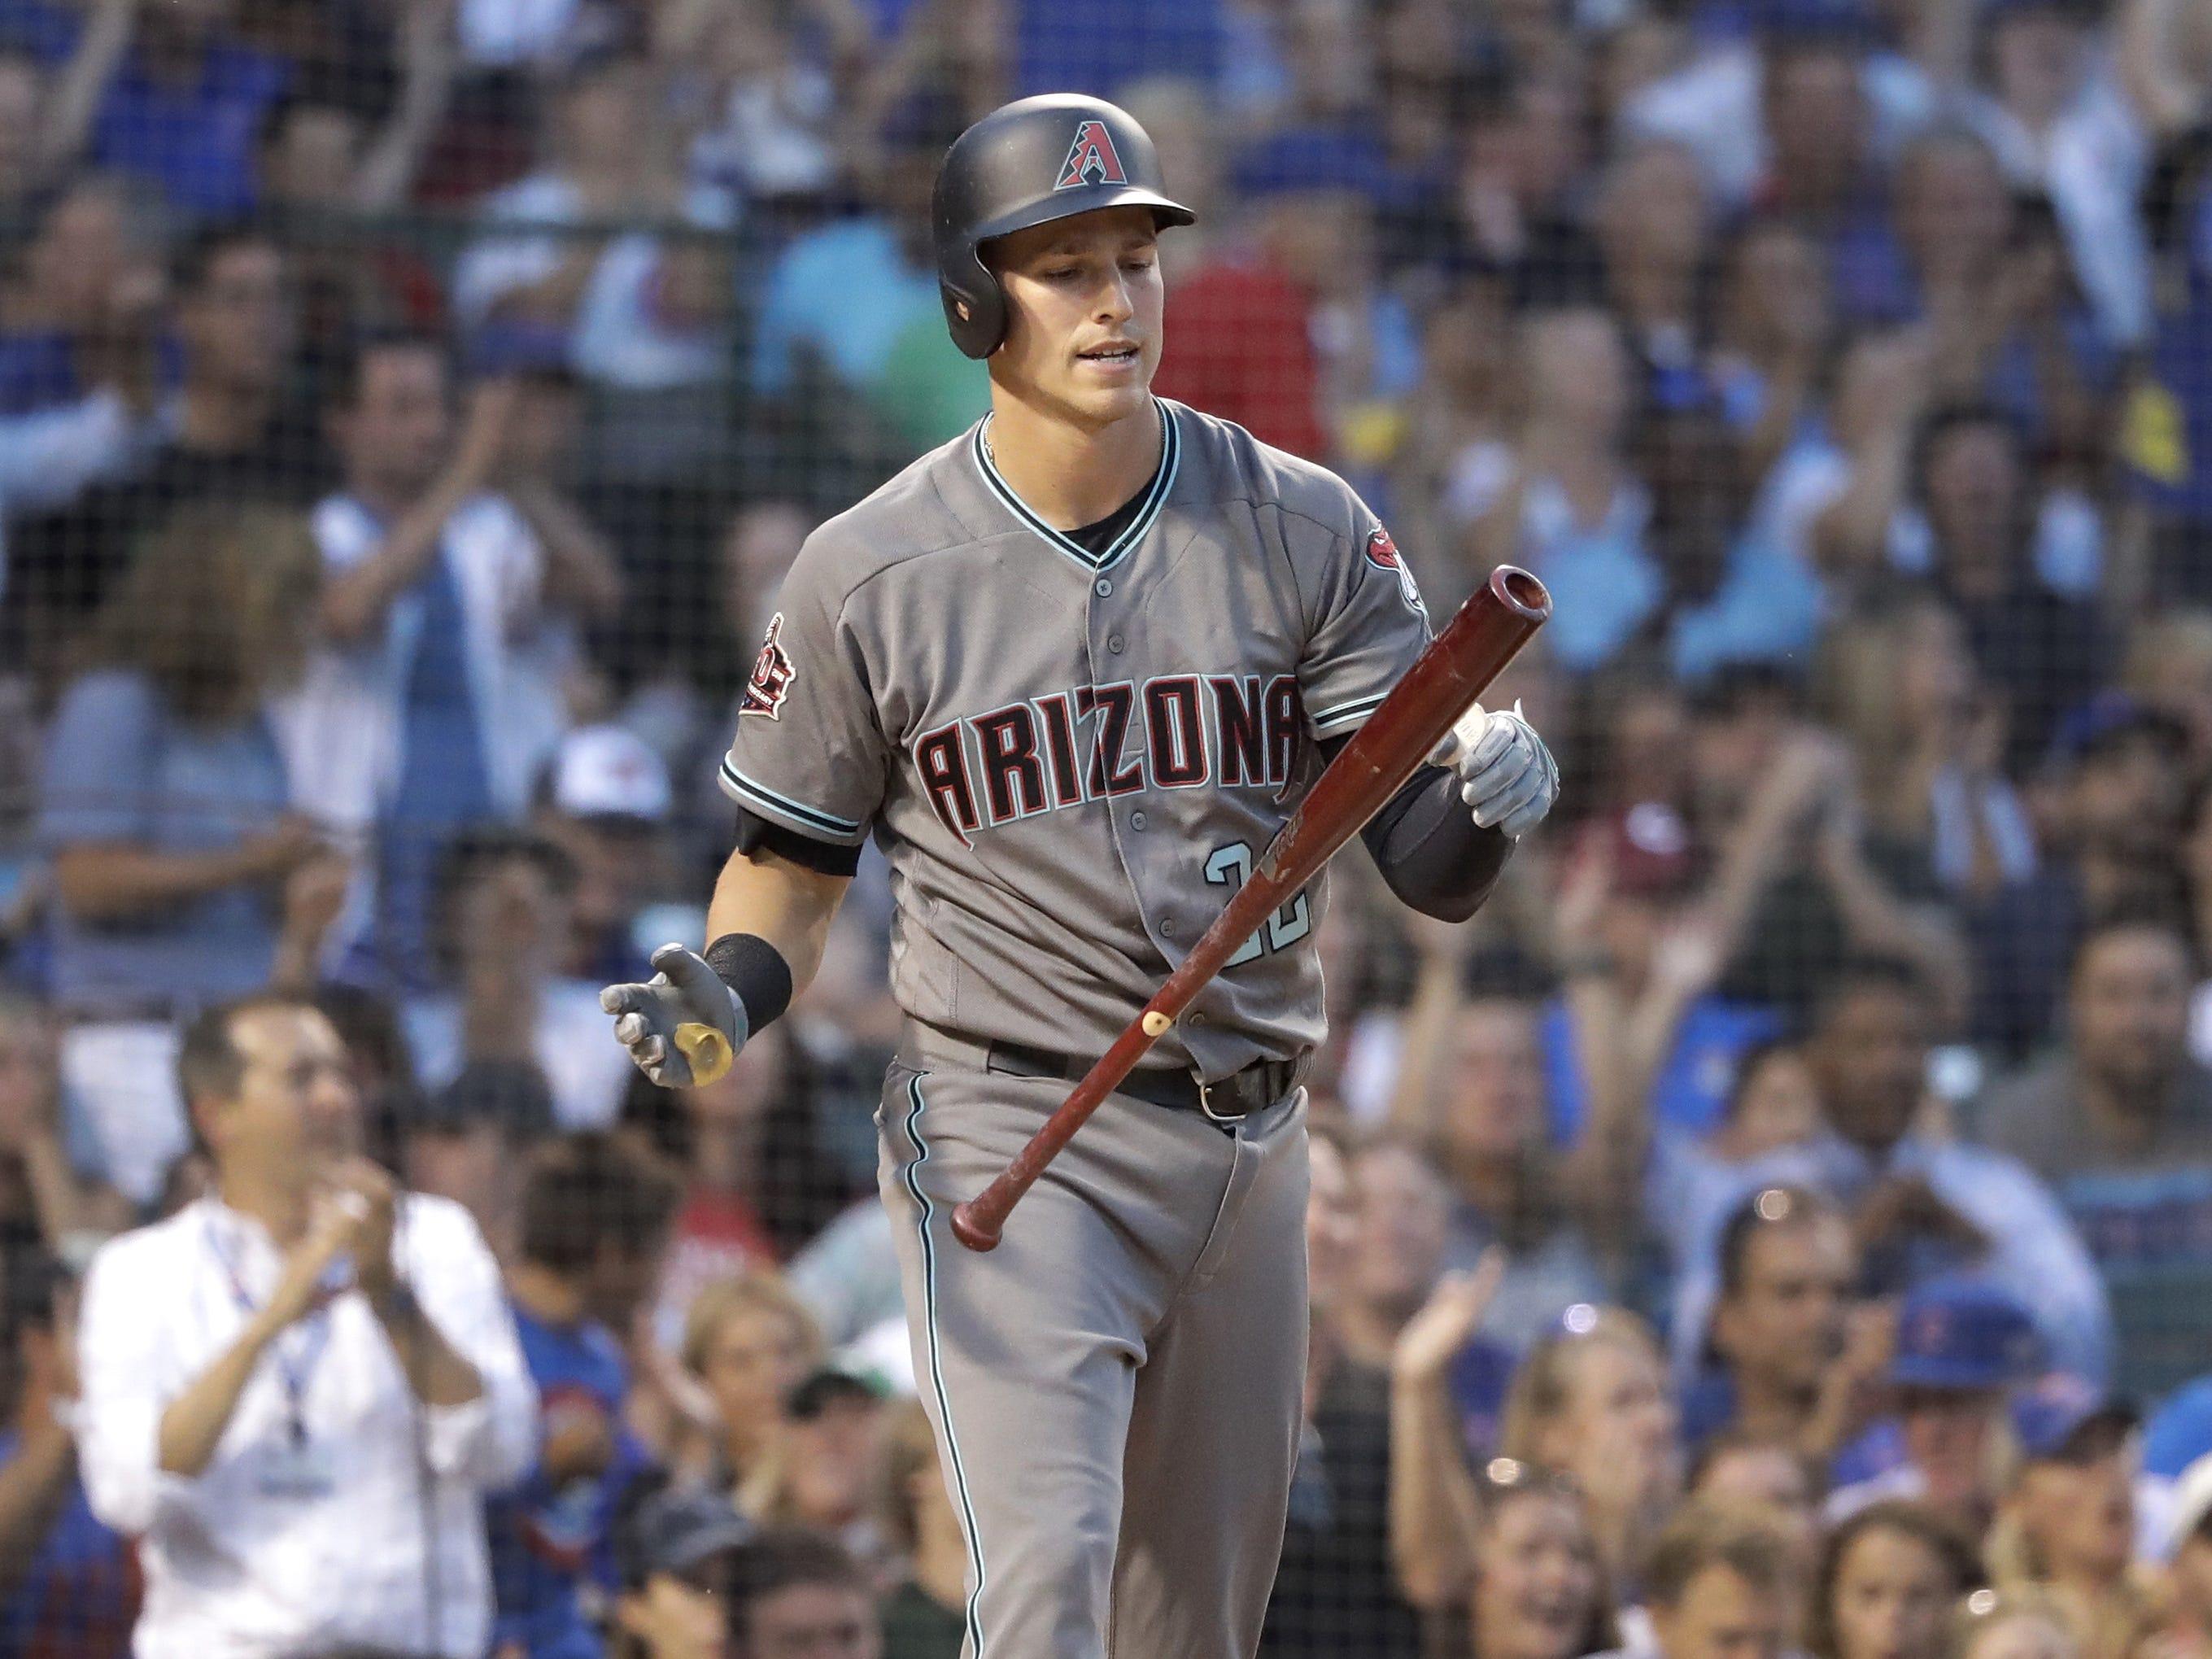 "Diamondbacks third baseman Jake Lamb paid $2.795 million for a ""modern farmhouse""in Scottsdale, public real estate records show."